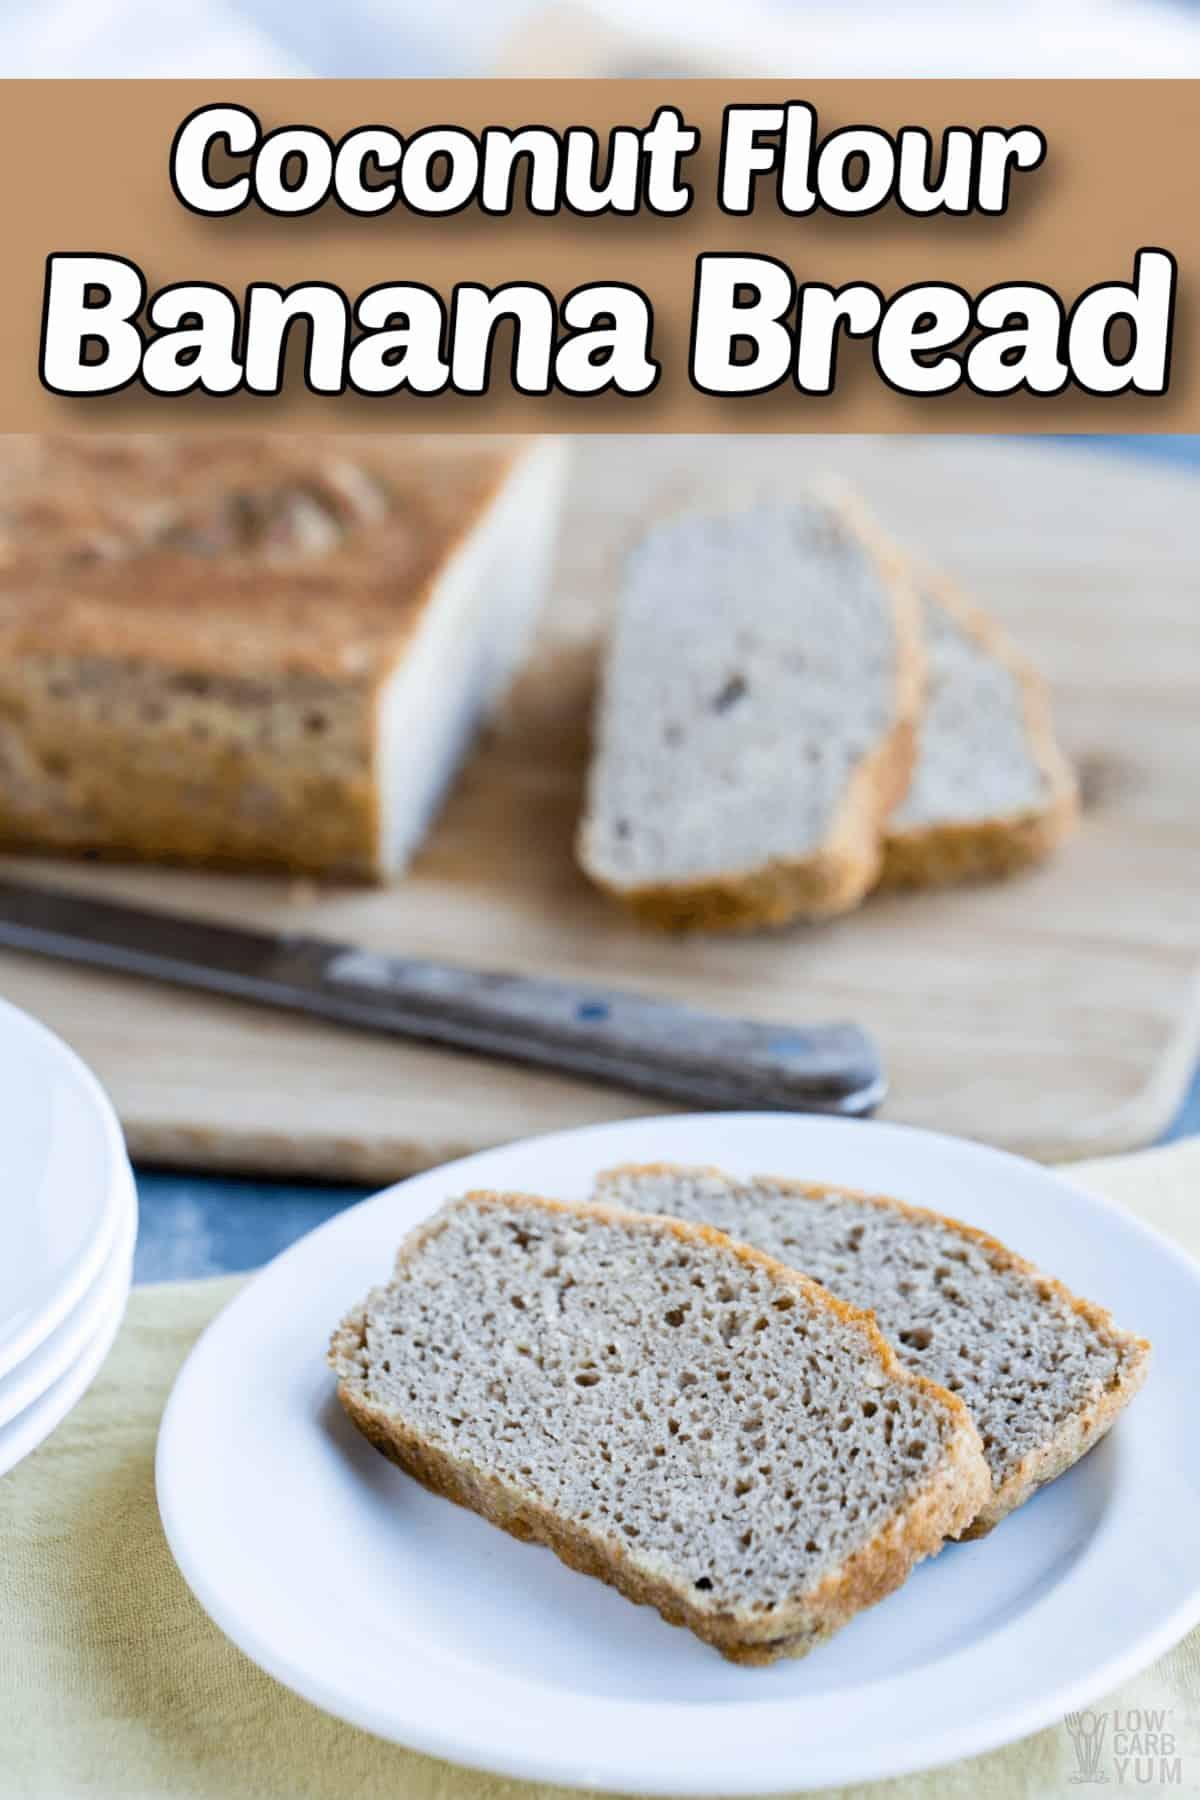 coconut flour banana bread paleo gluten free keto pintrest image